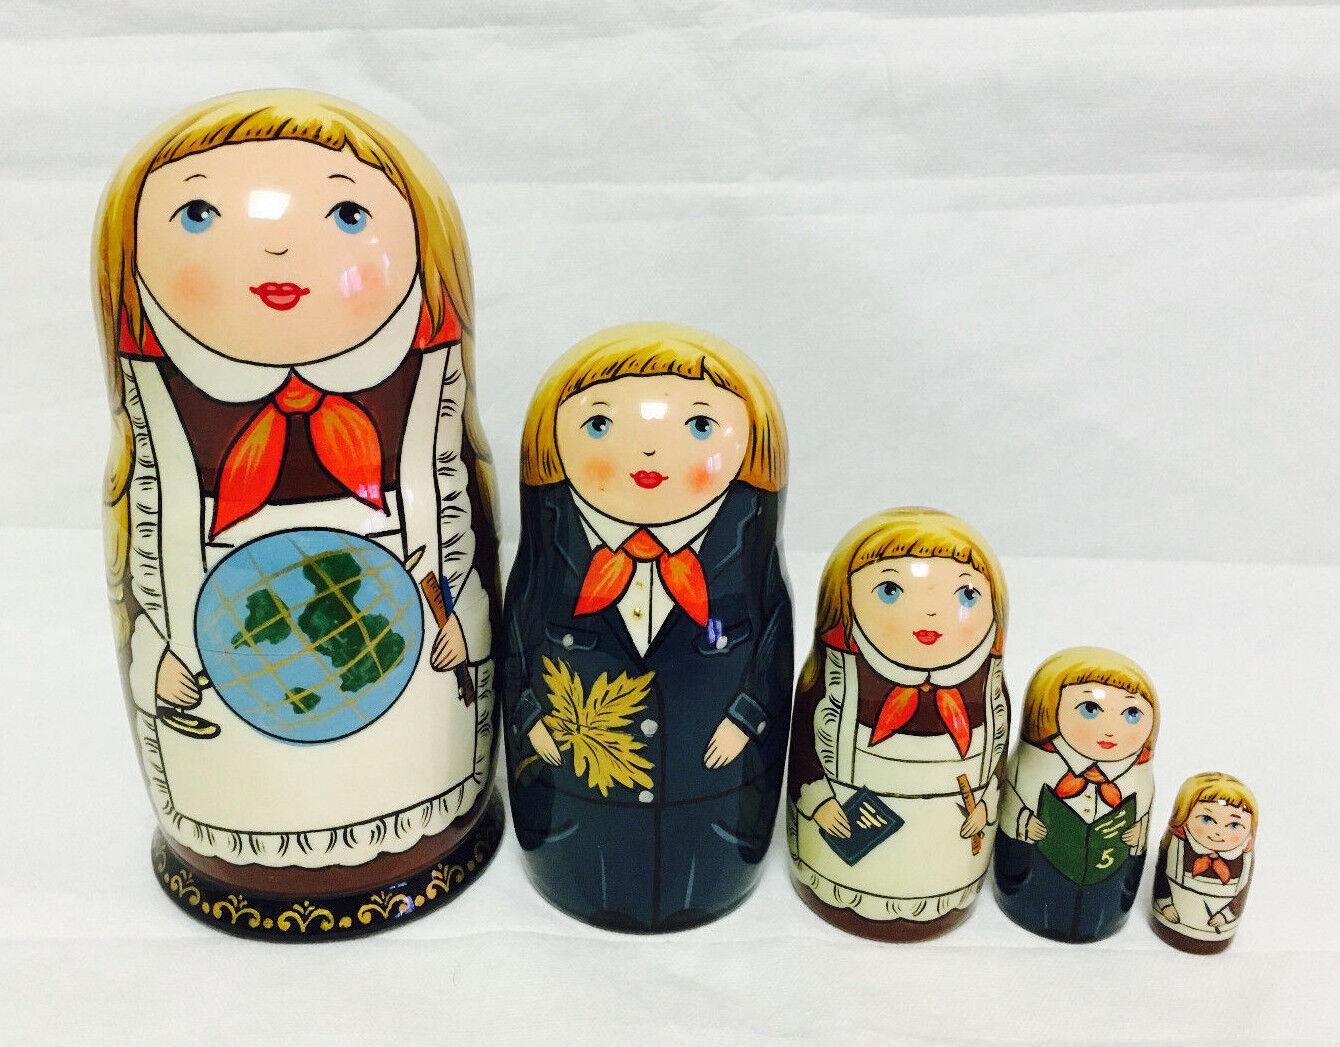 Russian Matryoshka Russian Wooden Nesting Dolls - 5 pieces  4